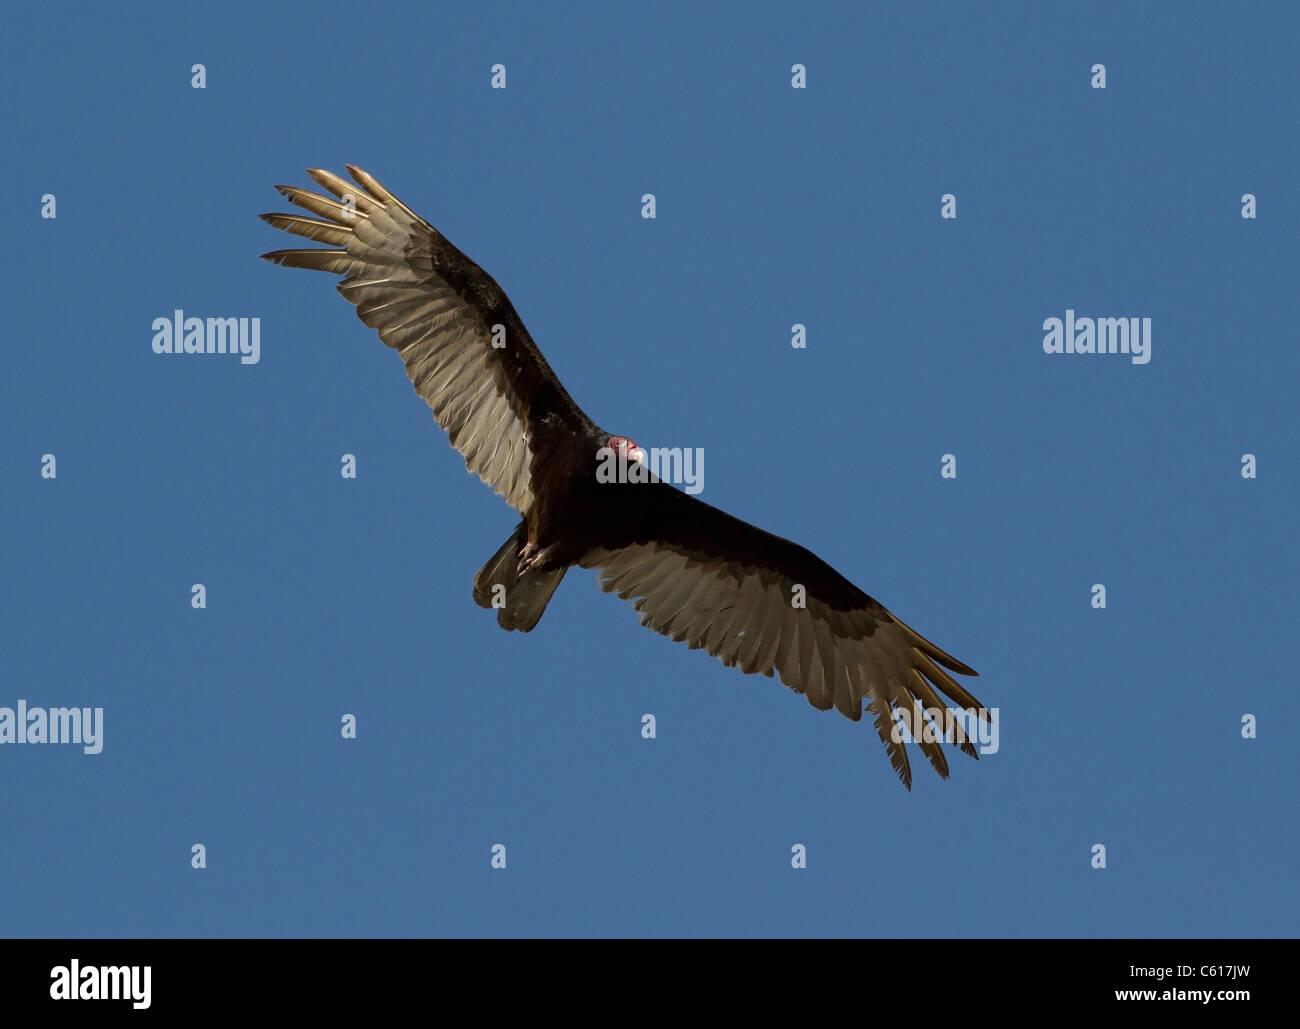 Turkey Vulture (Cathartes aura) in flight - Stock Image